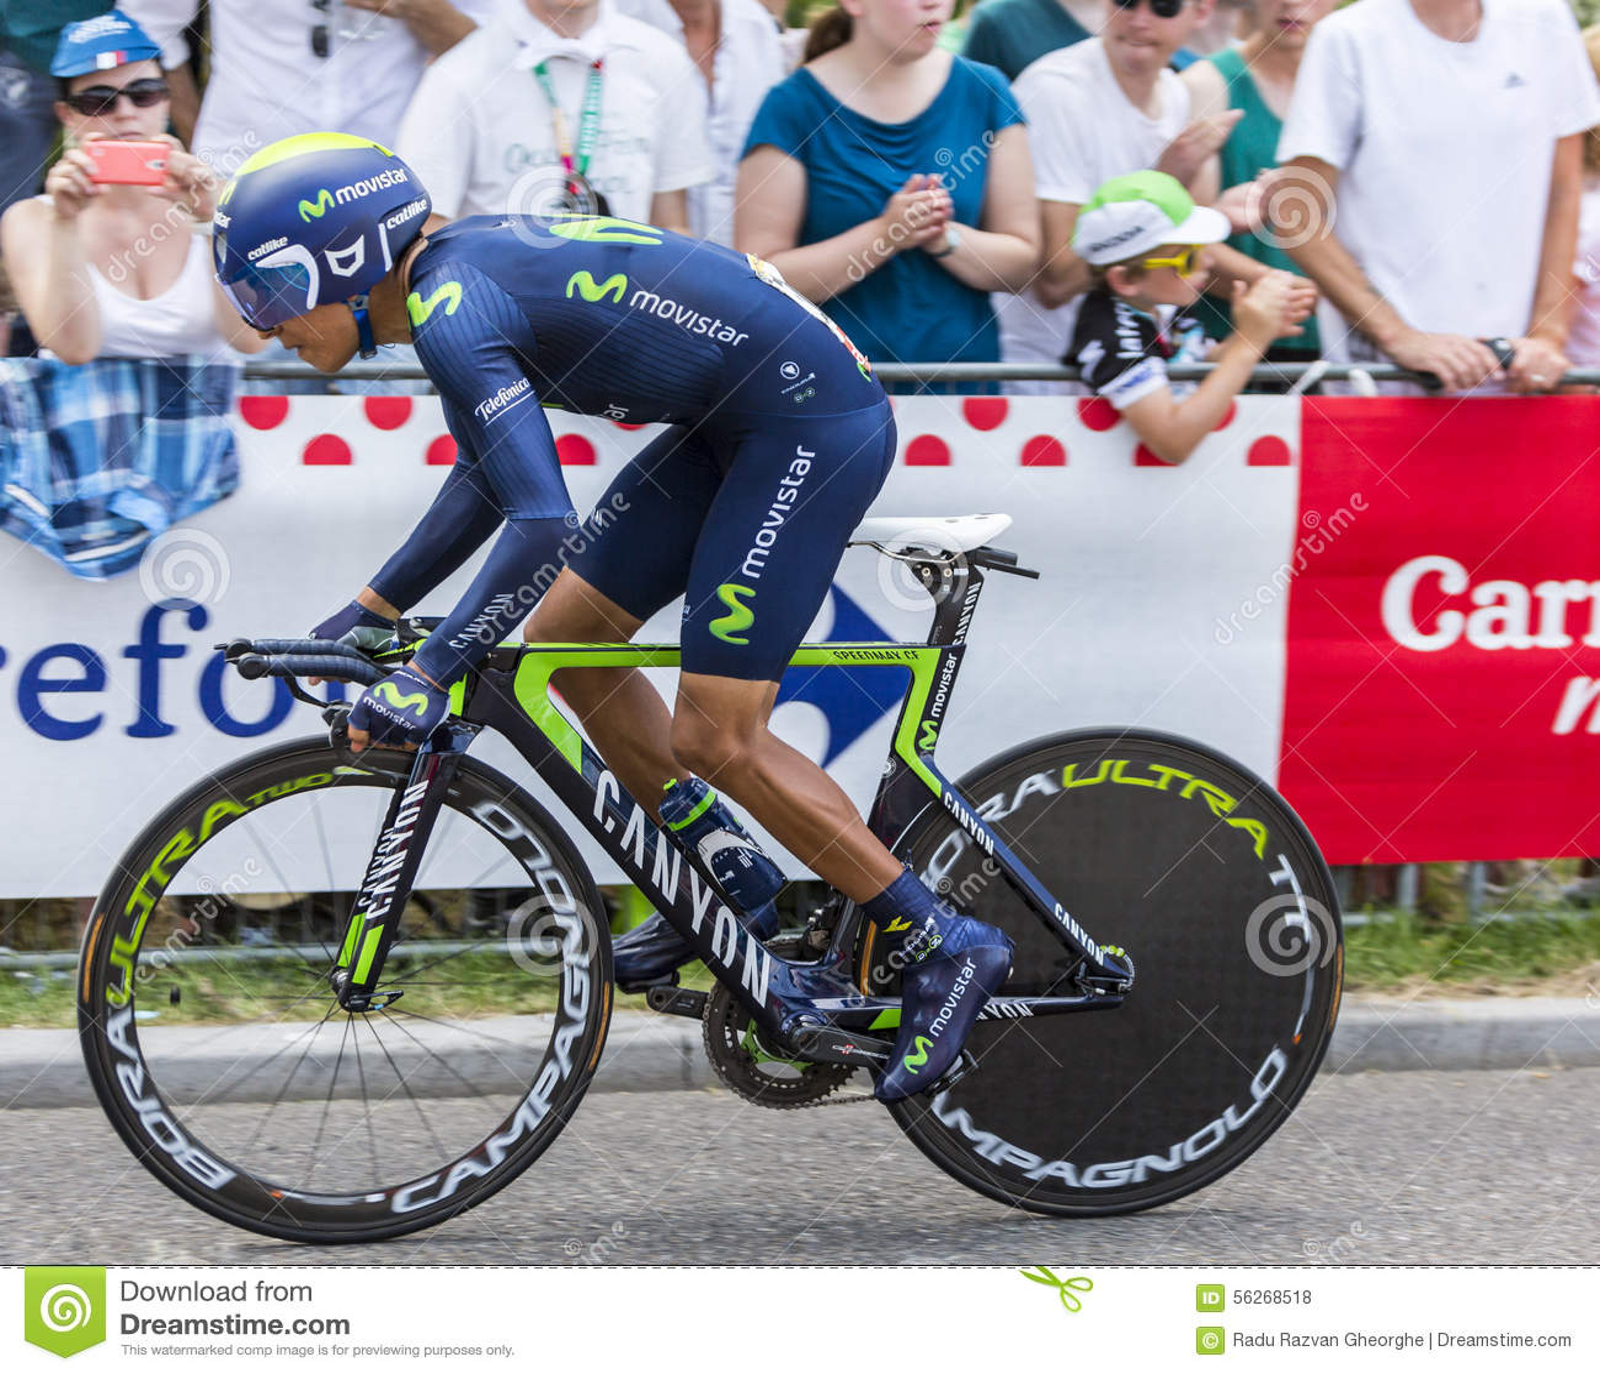 86d351f4d The Cyclist Nairo Quintana - Tour De France 2015 Editorial Stock ...